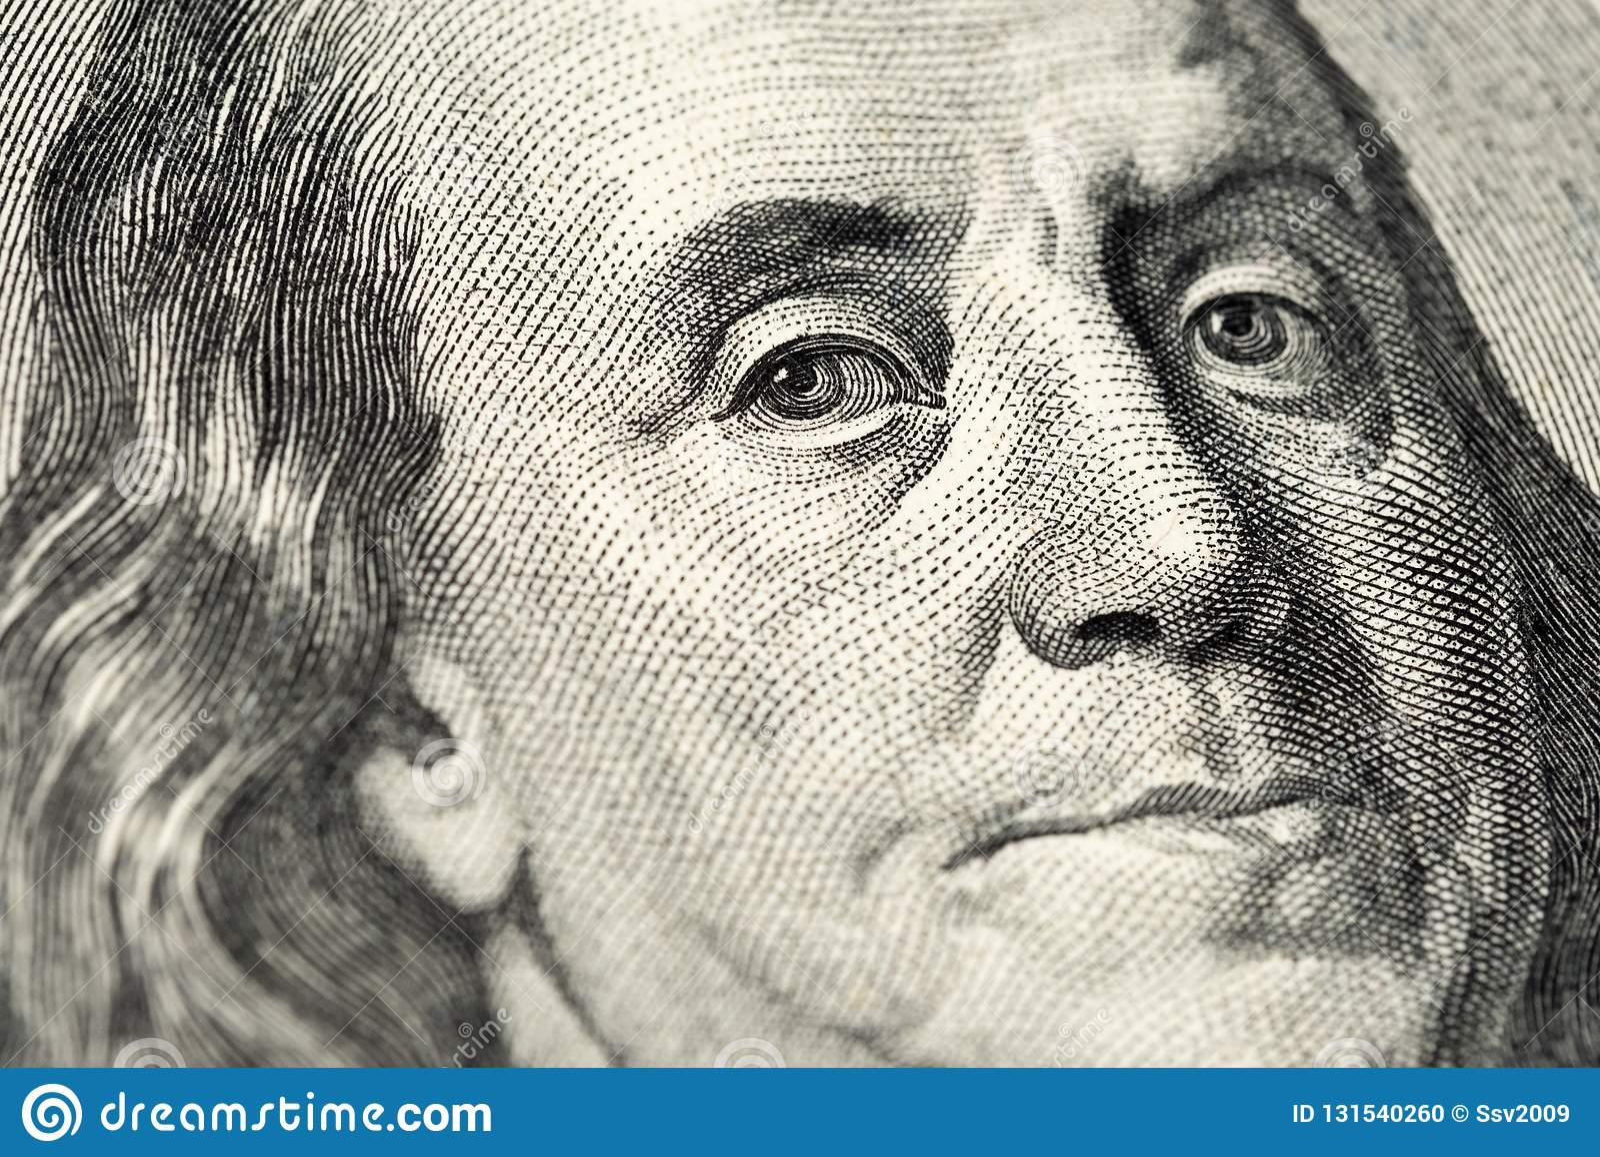 Benjamin Franklin S Portrait On One Hundred 100 American